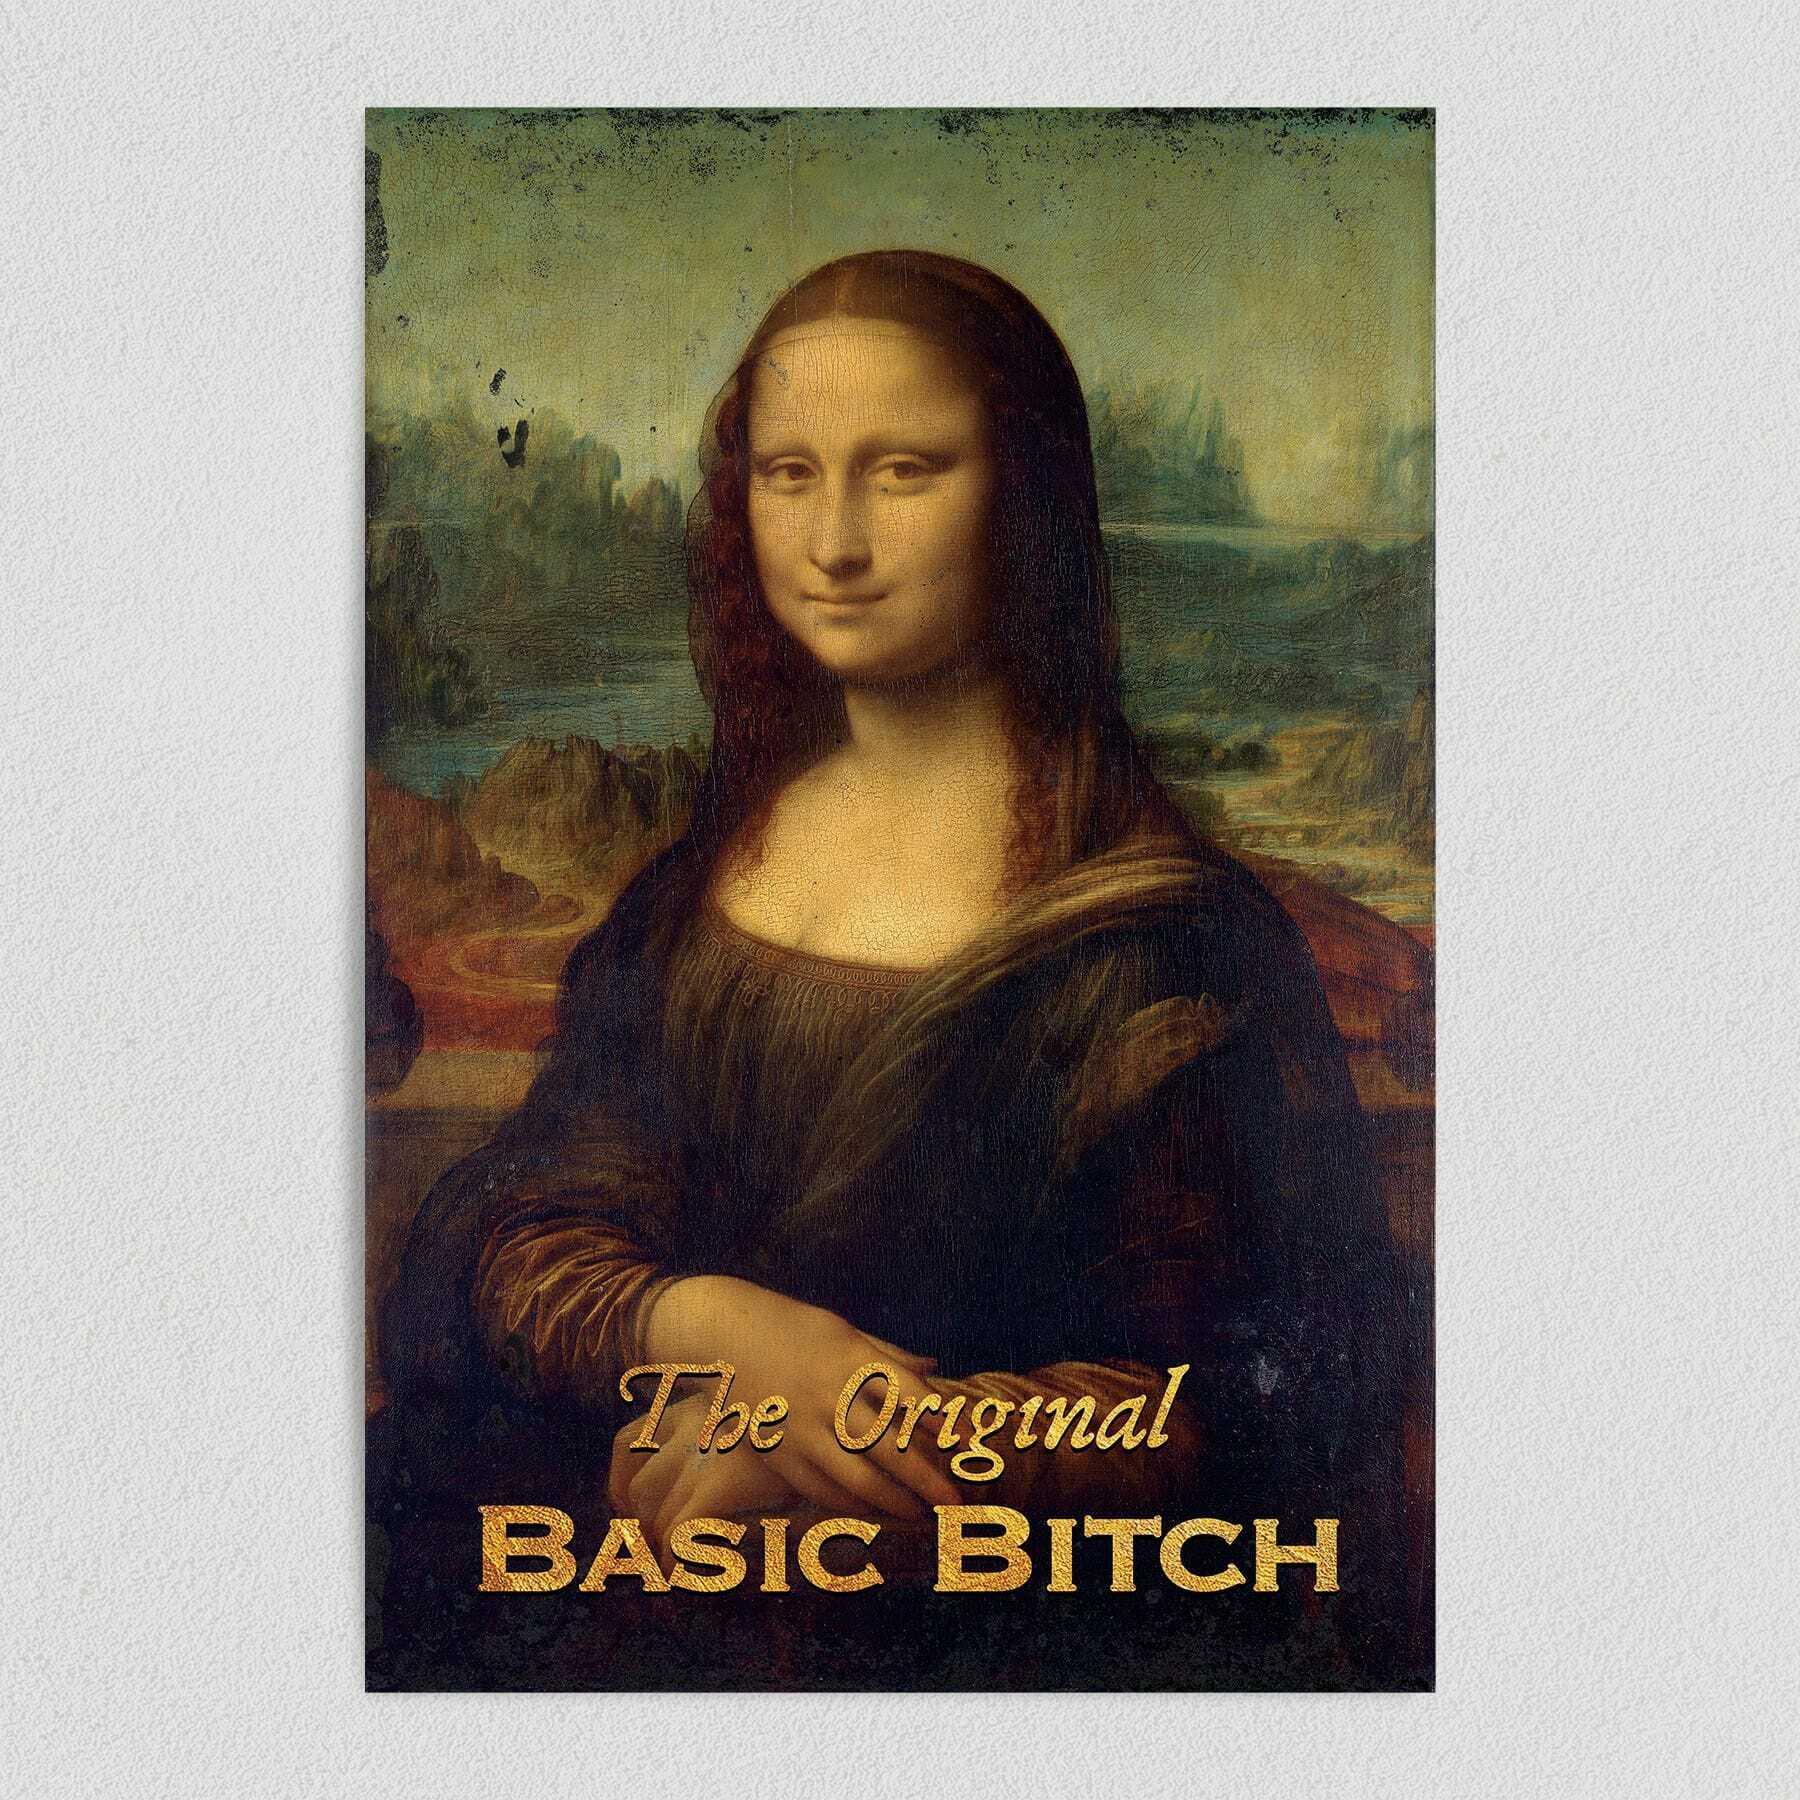 Mona Lisa Basic Bitch Adult Humor Art Print Poster 12″ x 18″ Wall Art H1030